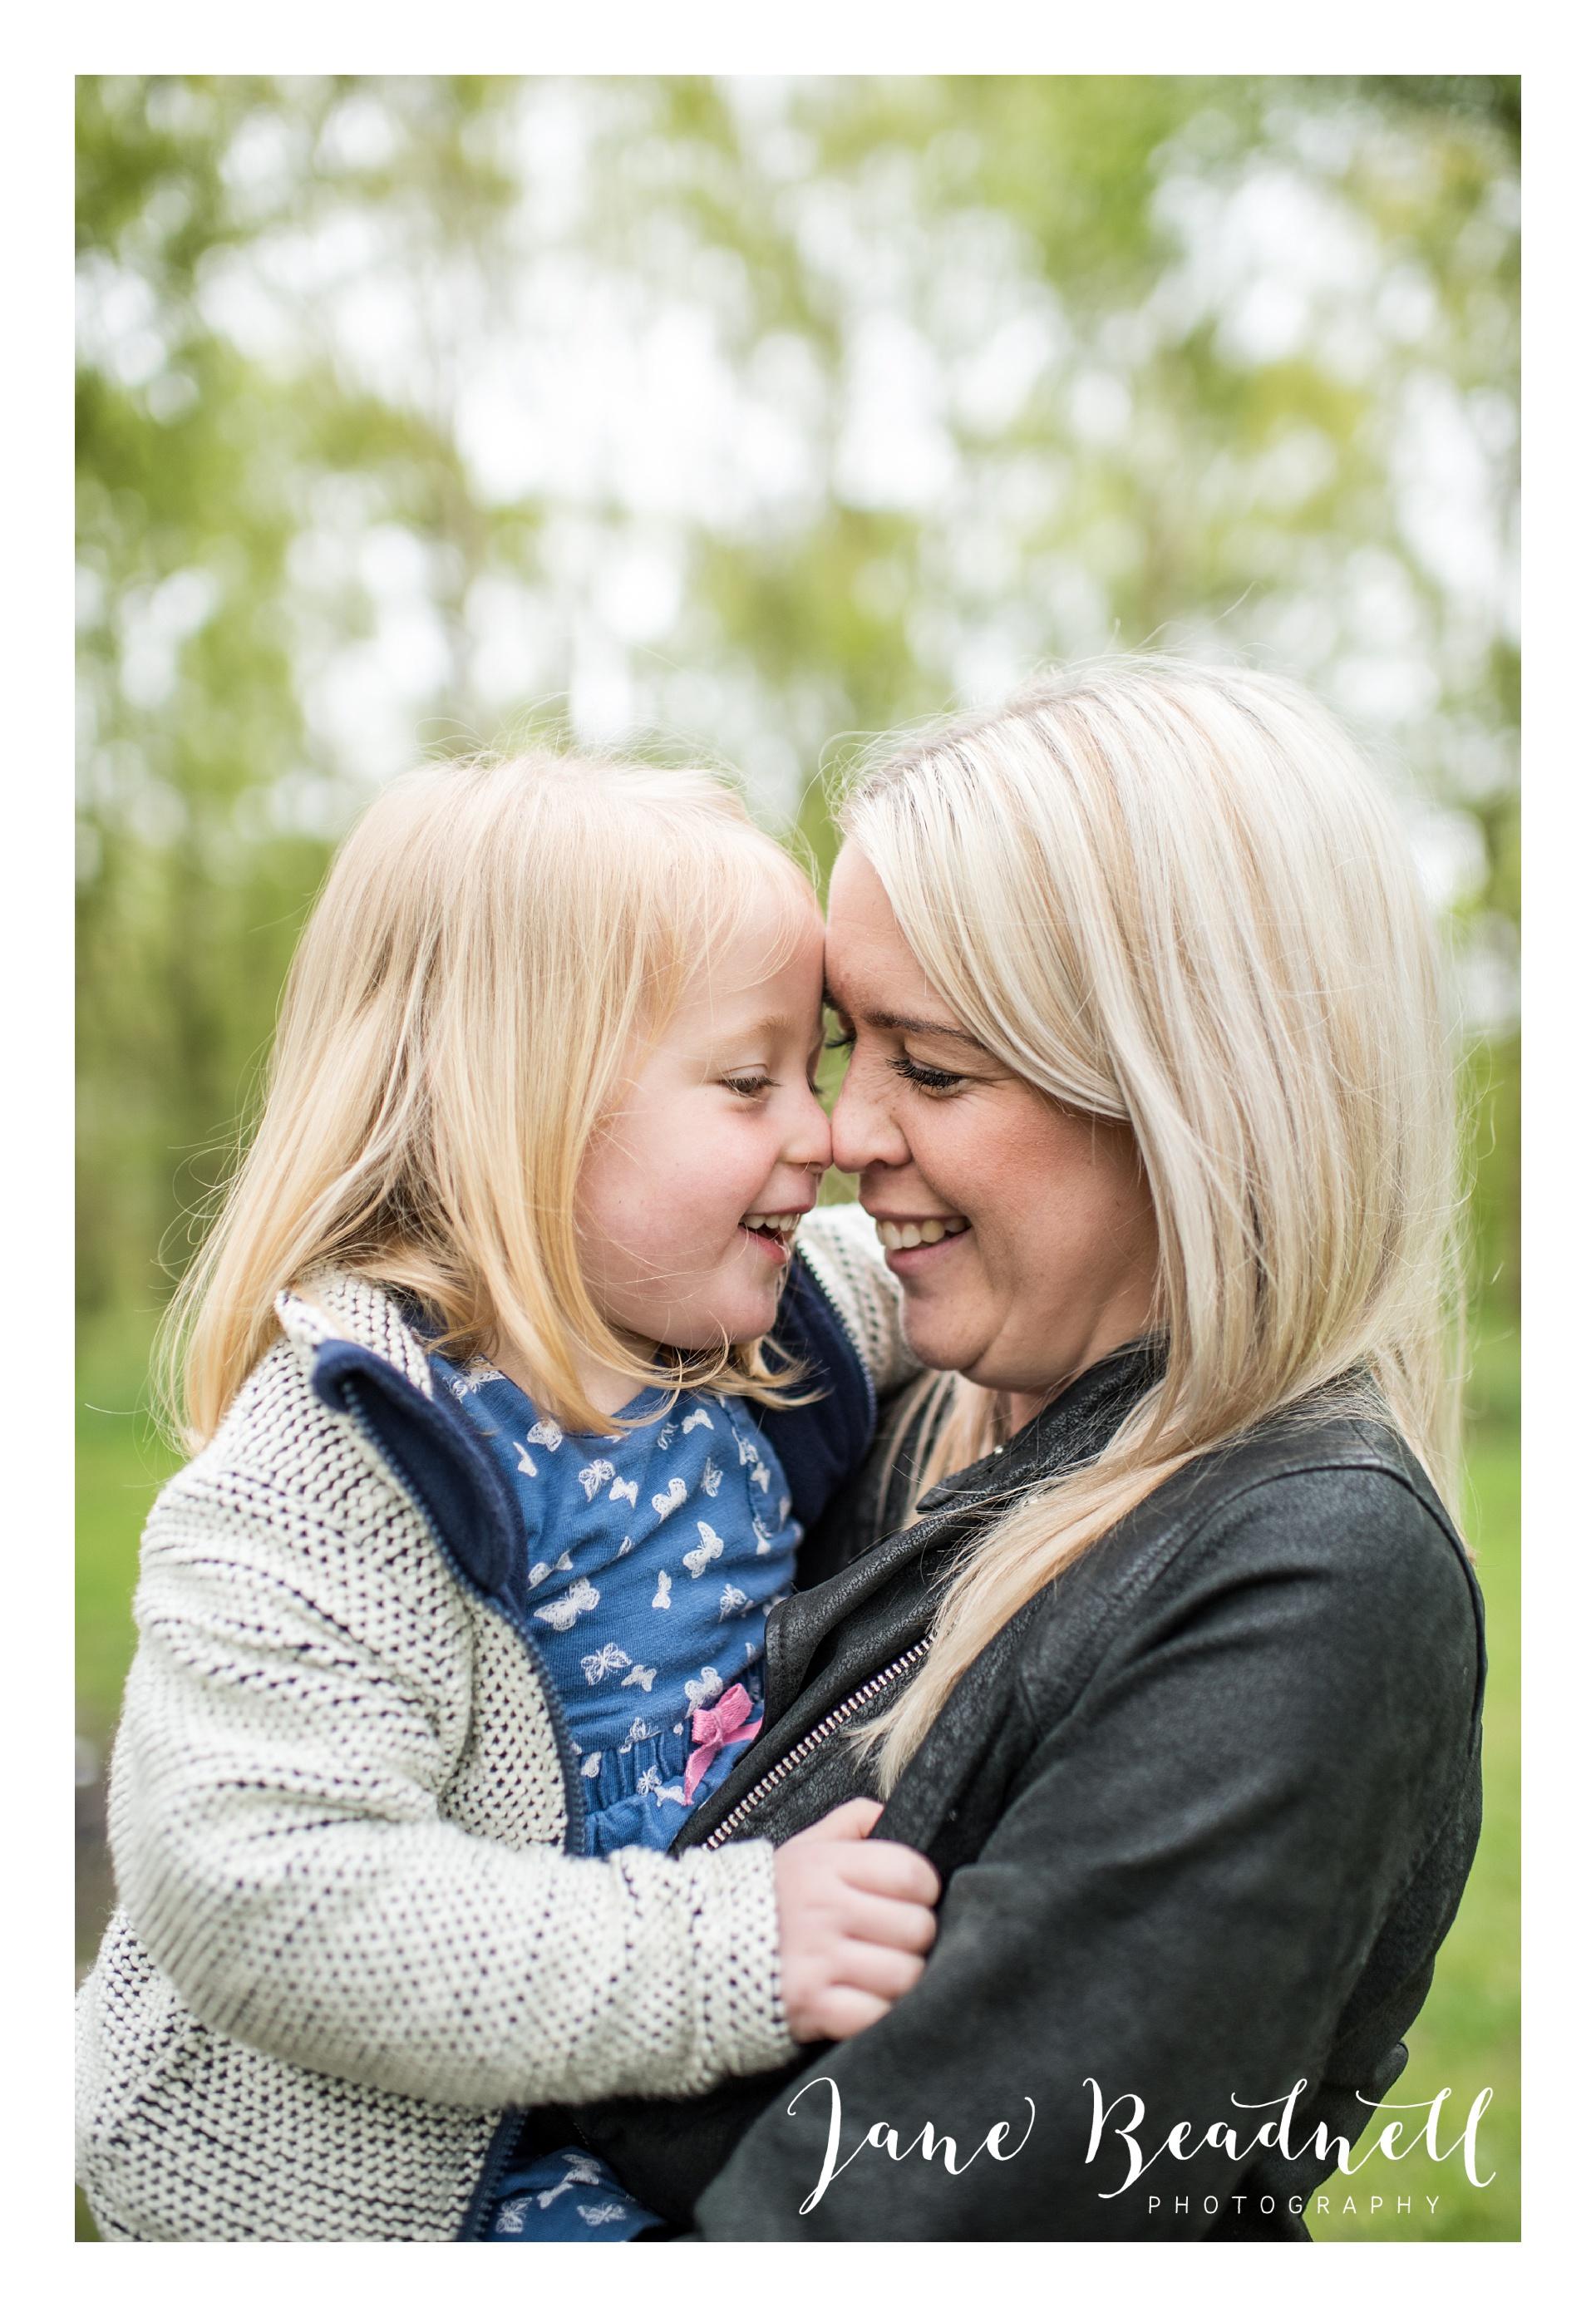 Jane Beadnell Photography Family Portrait photography Otley_0017